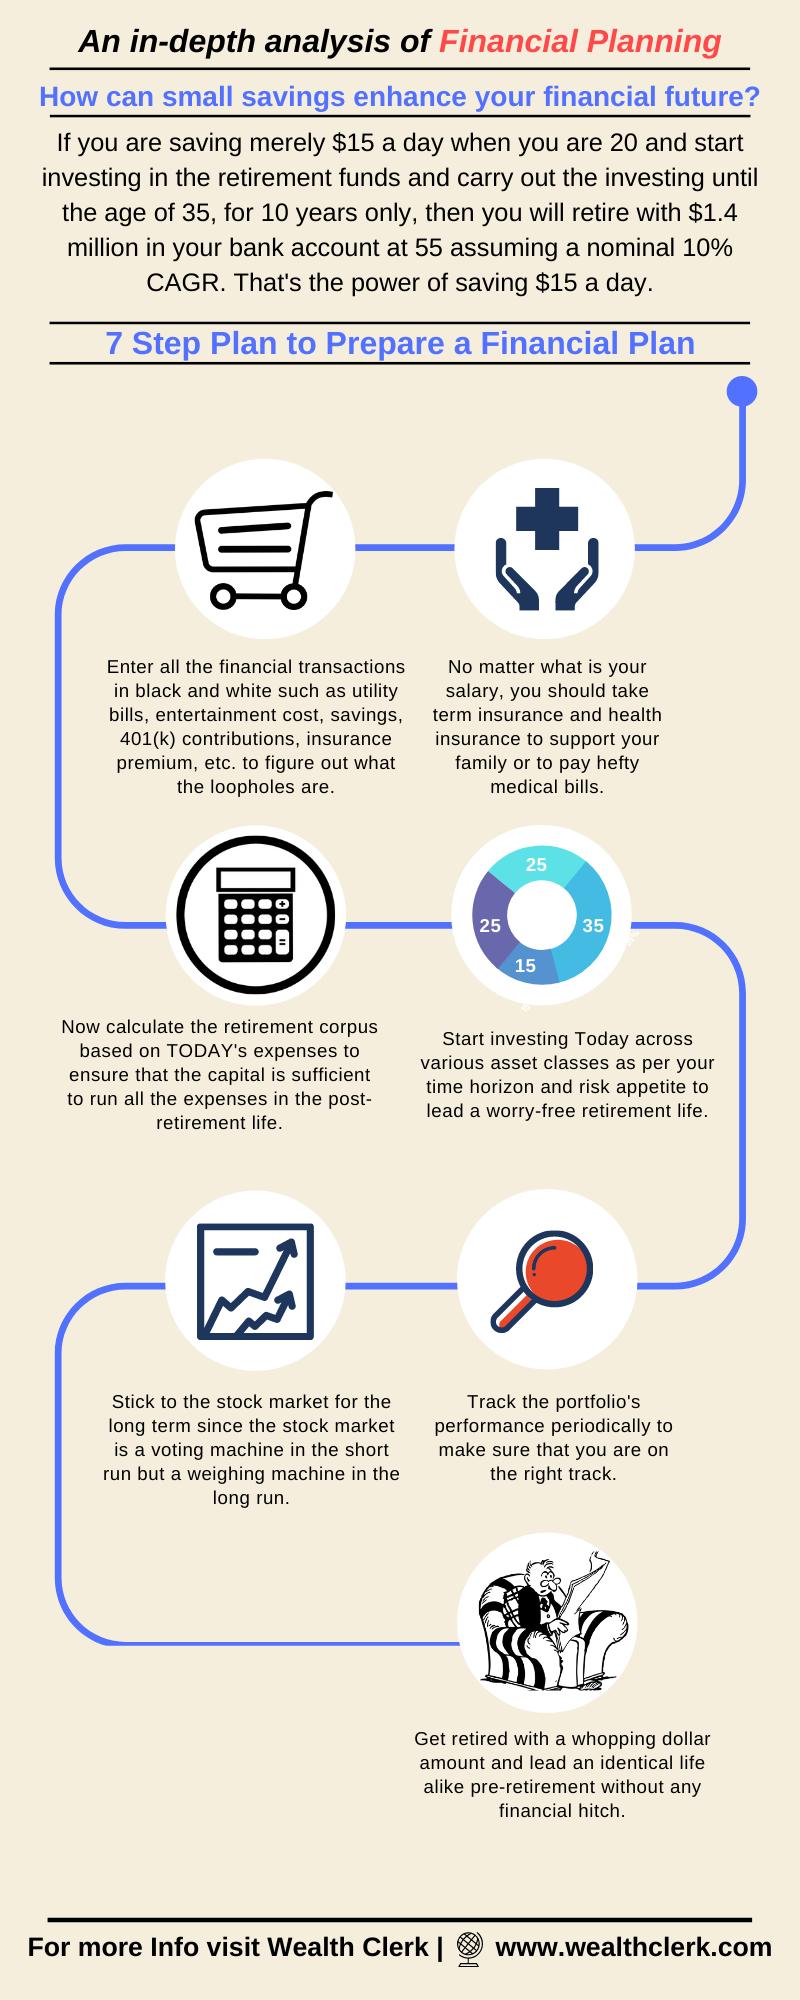 7 step financial plan